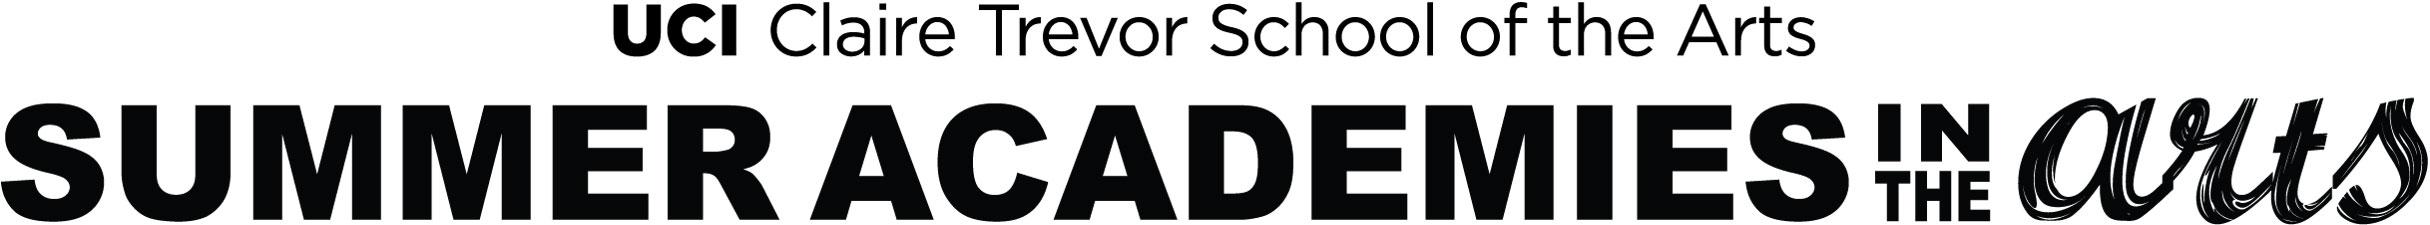 Summer Academies in the Arts